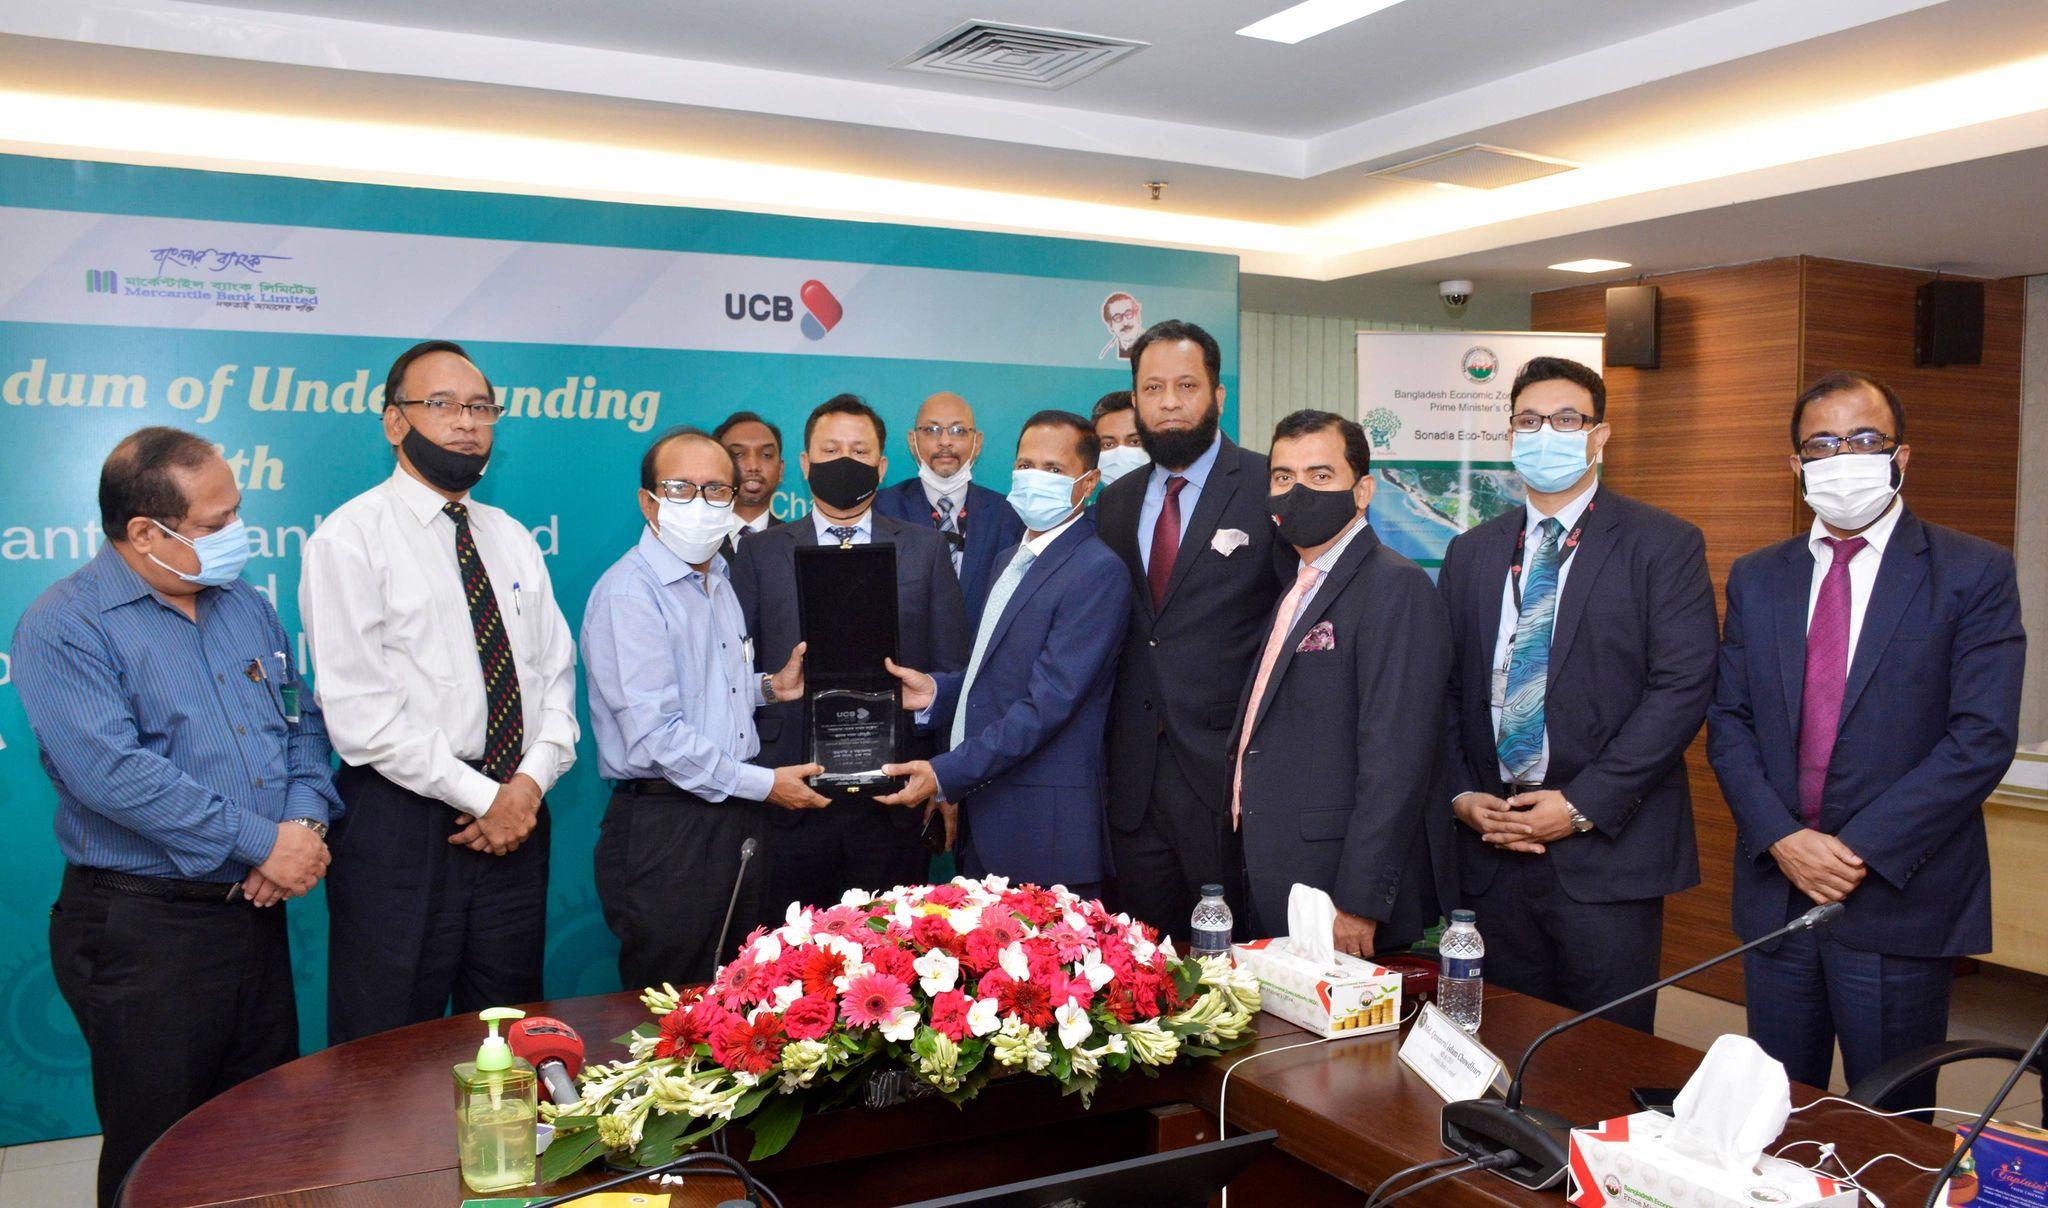 UCB signs MoU with BEZA to open branch at Bangabandhu Shilpa Nagar